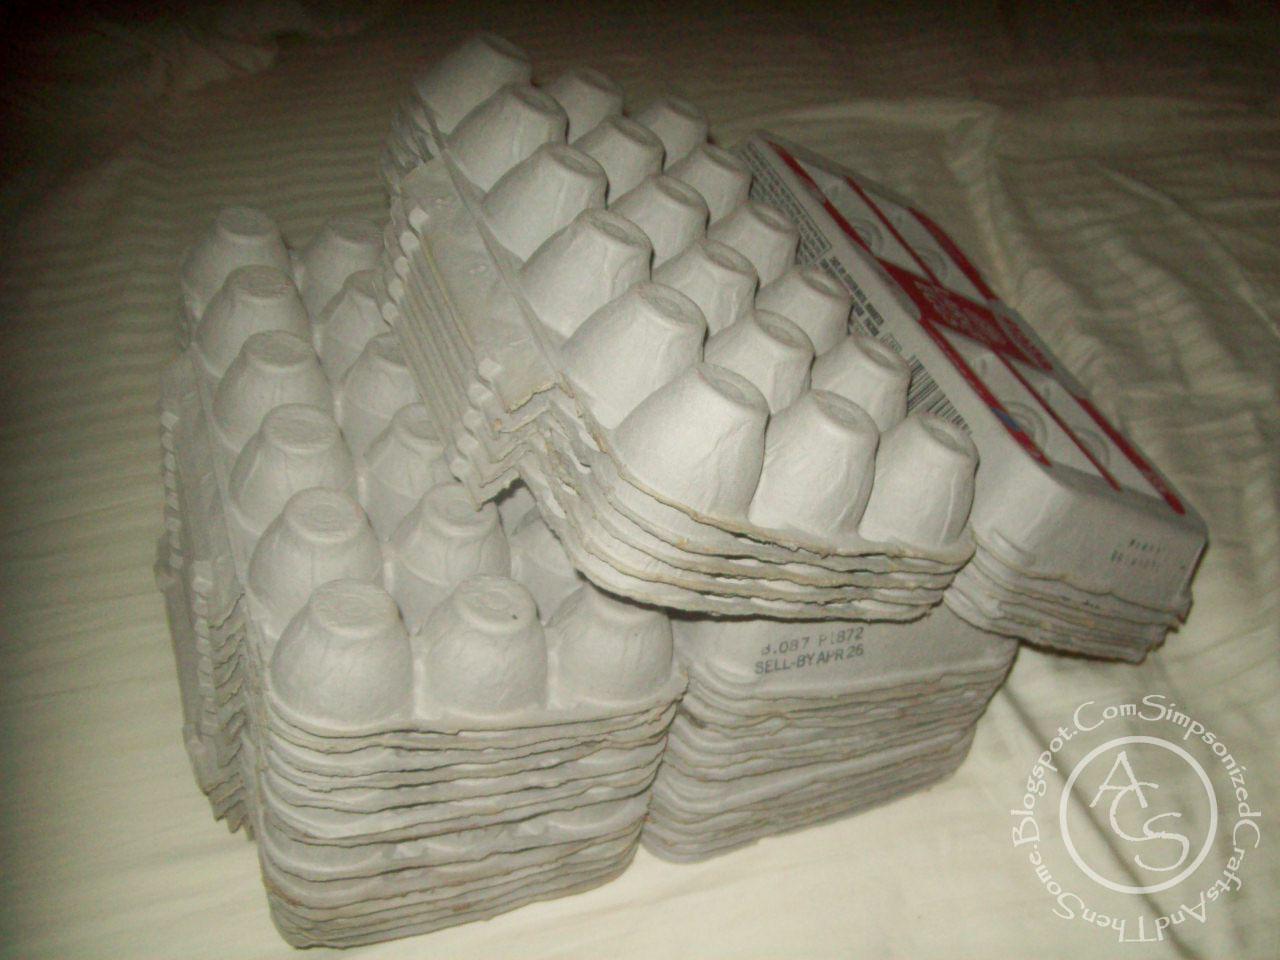 Simpsonized crafts using egg carton for decor for Styrofoam egg carton crafts